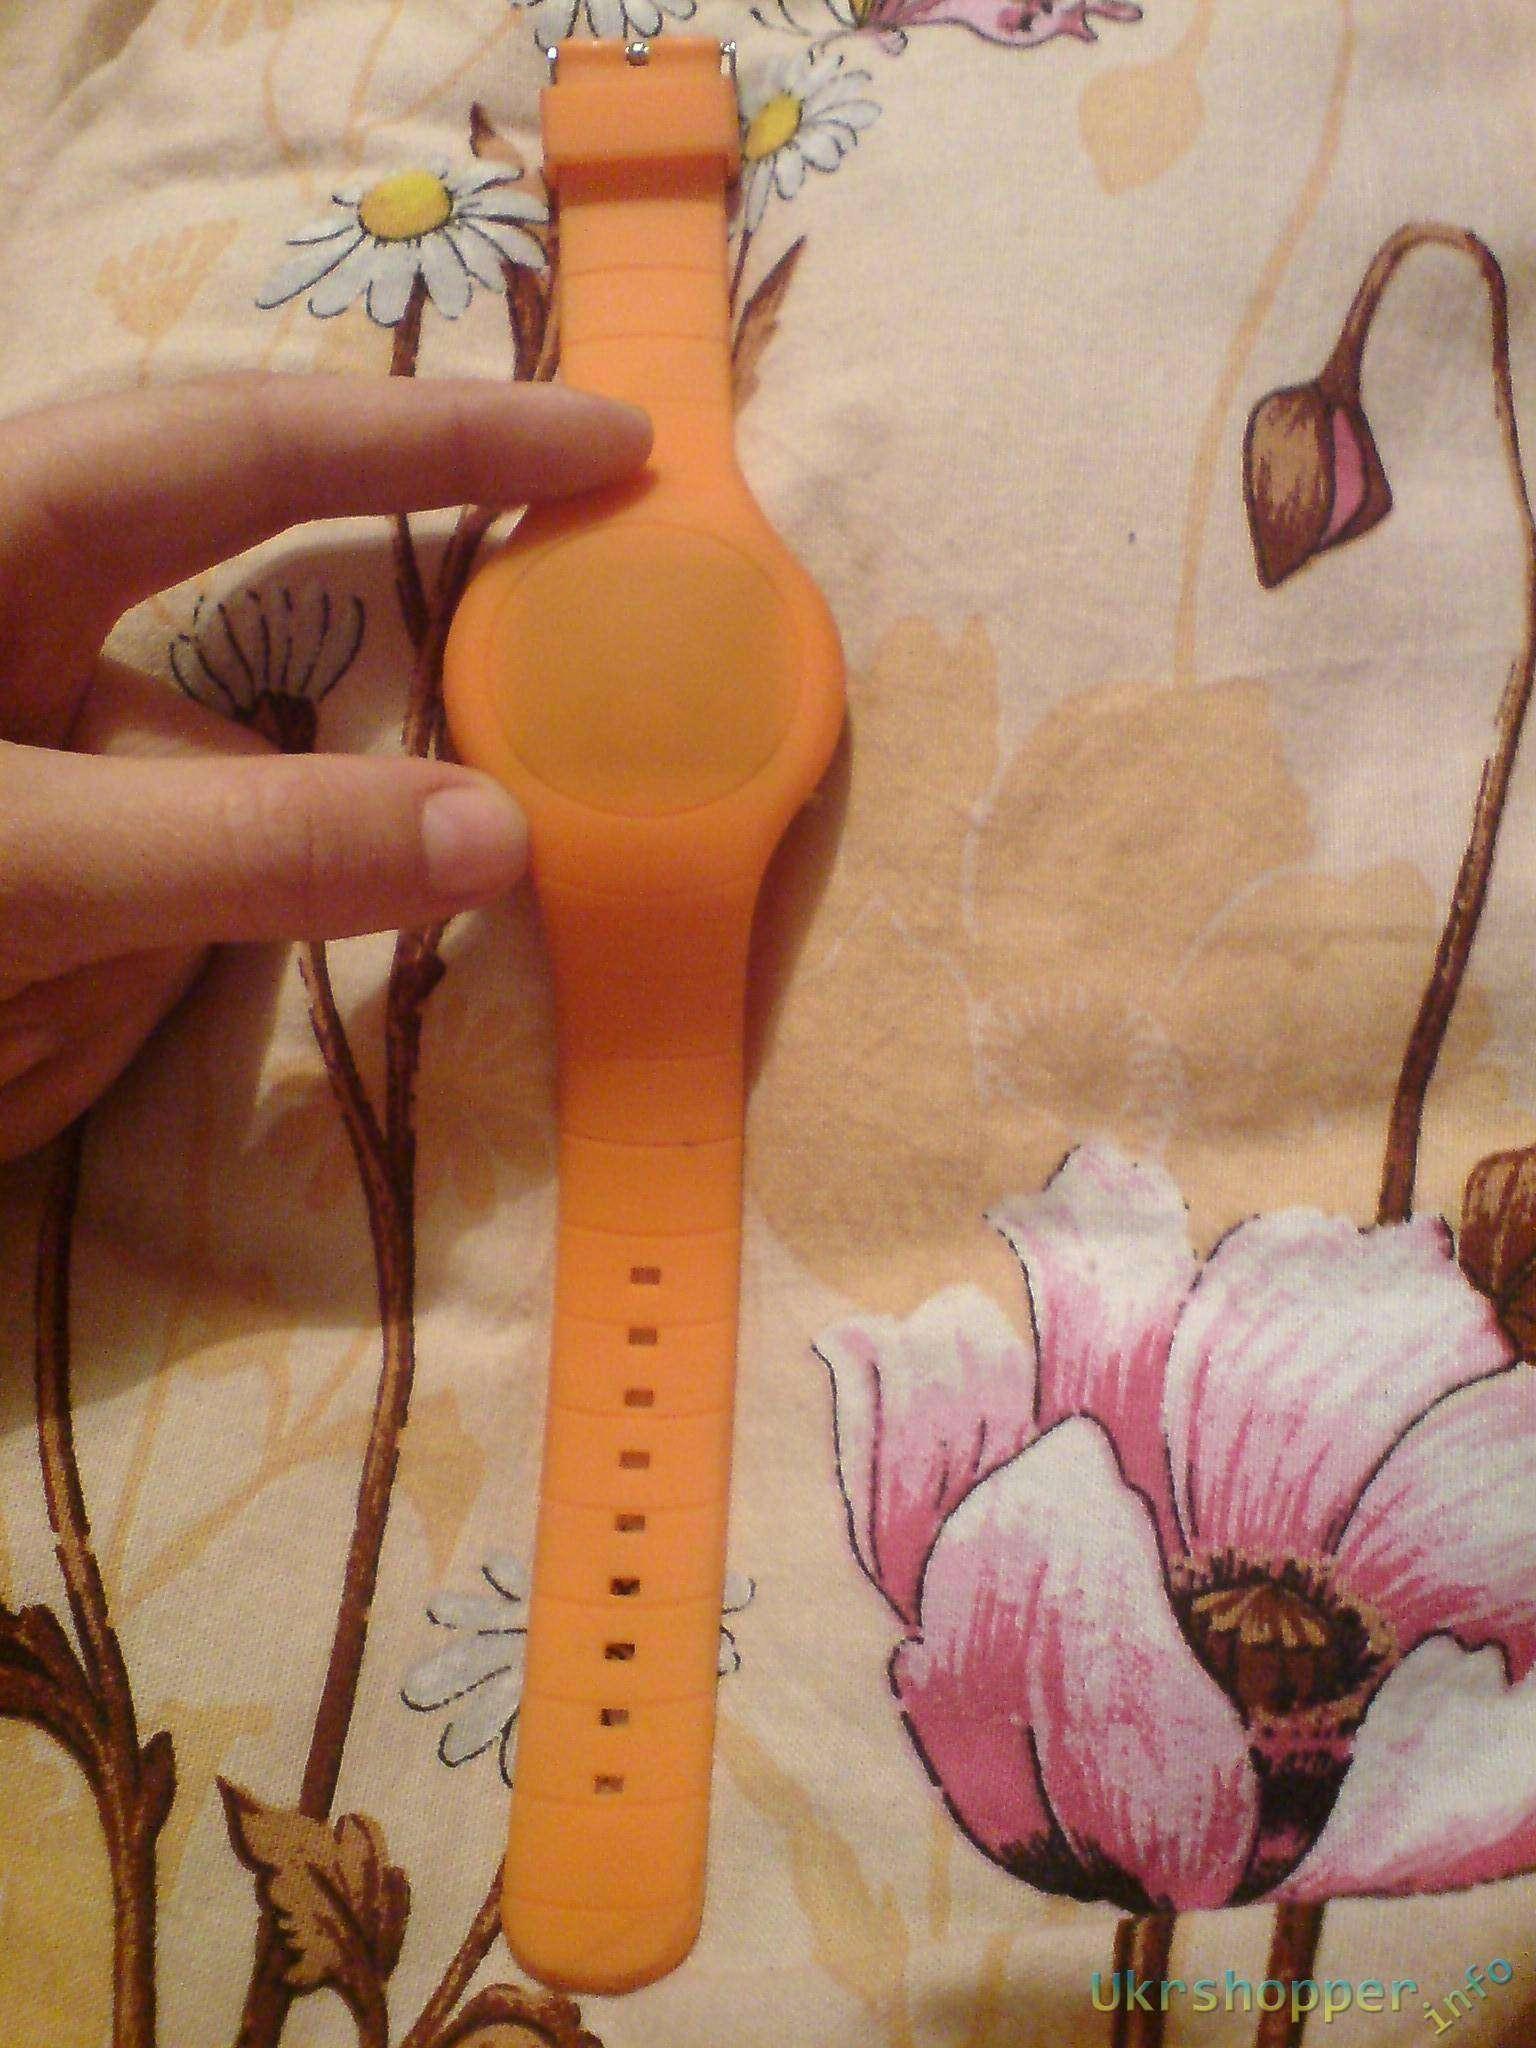 TinyDeal: Милые силиконовые часы загадка.Ultrathin Touch Screen Creative LED Watch Wristwatch Timepiece with Rubber Band for Man Woman WUS-201058